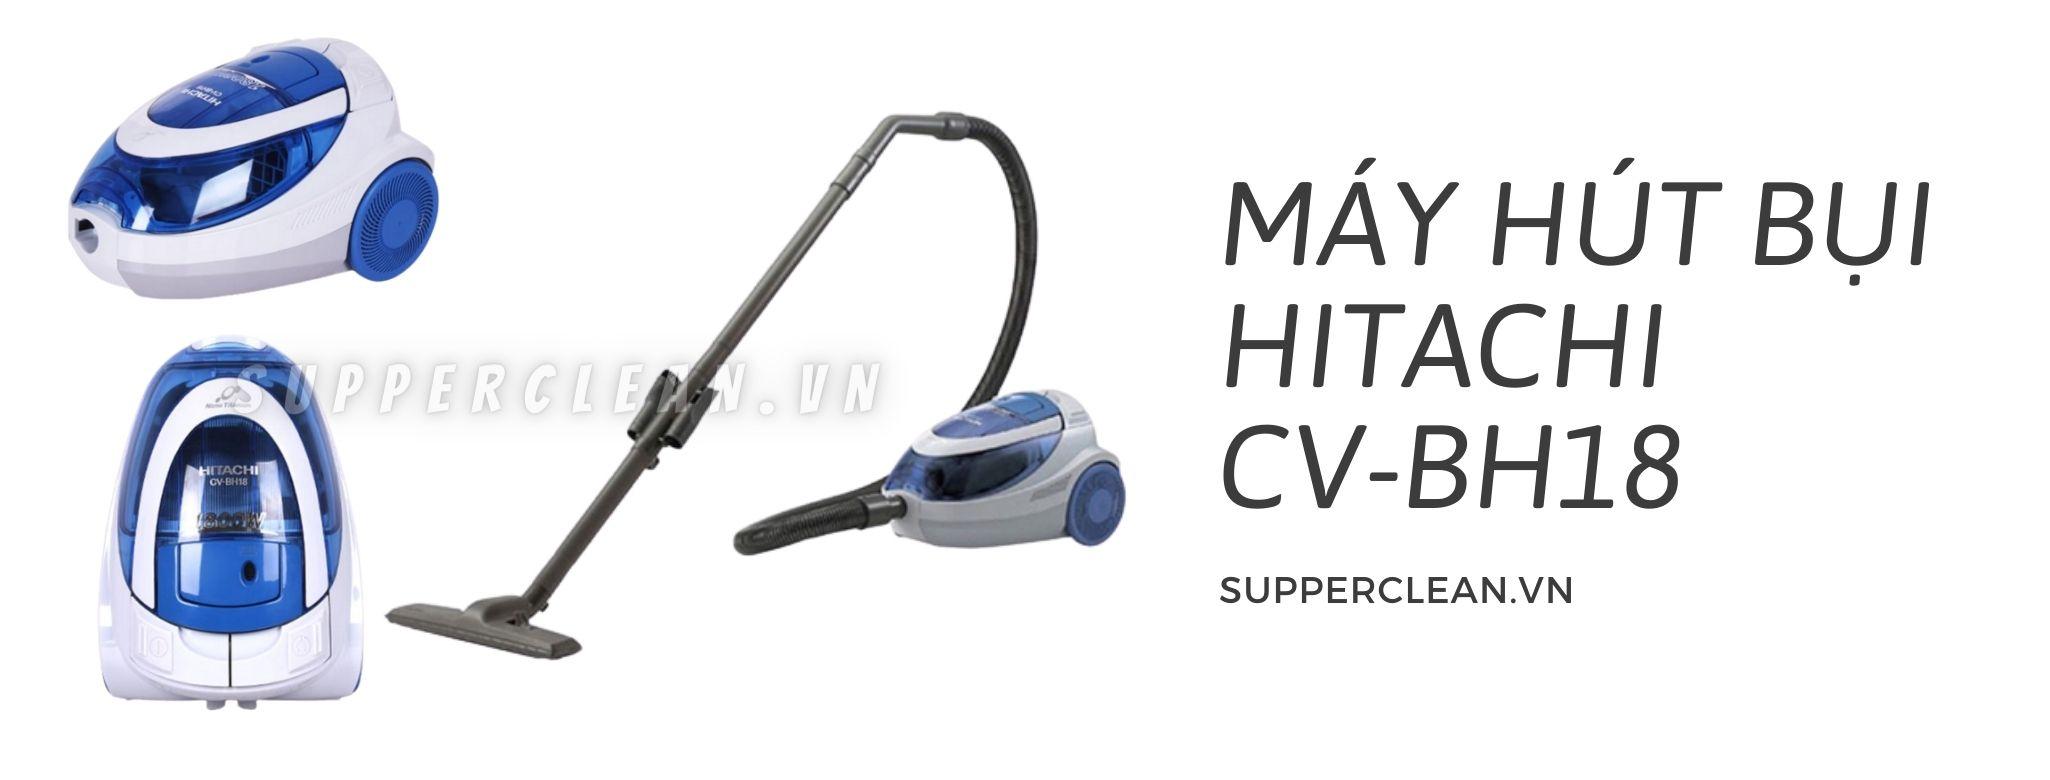 may-hut-bui-hitachi-cv-bh18